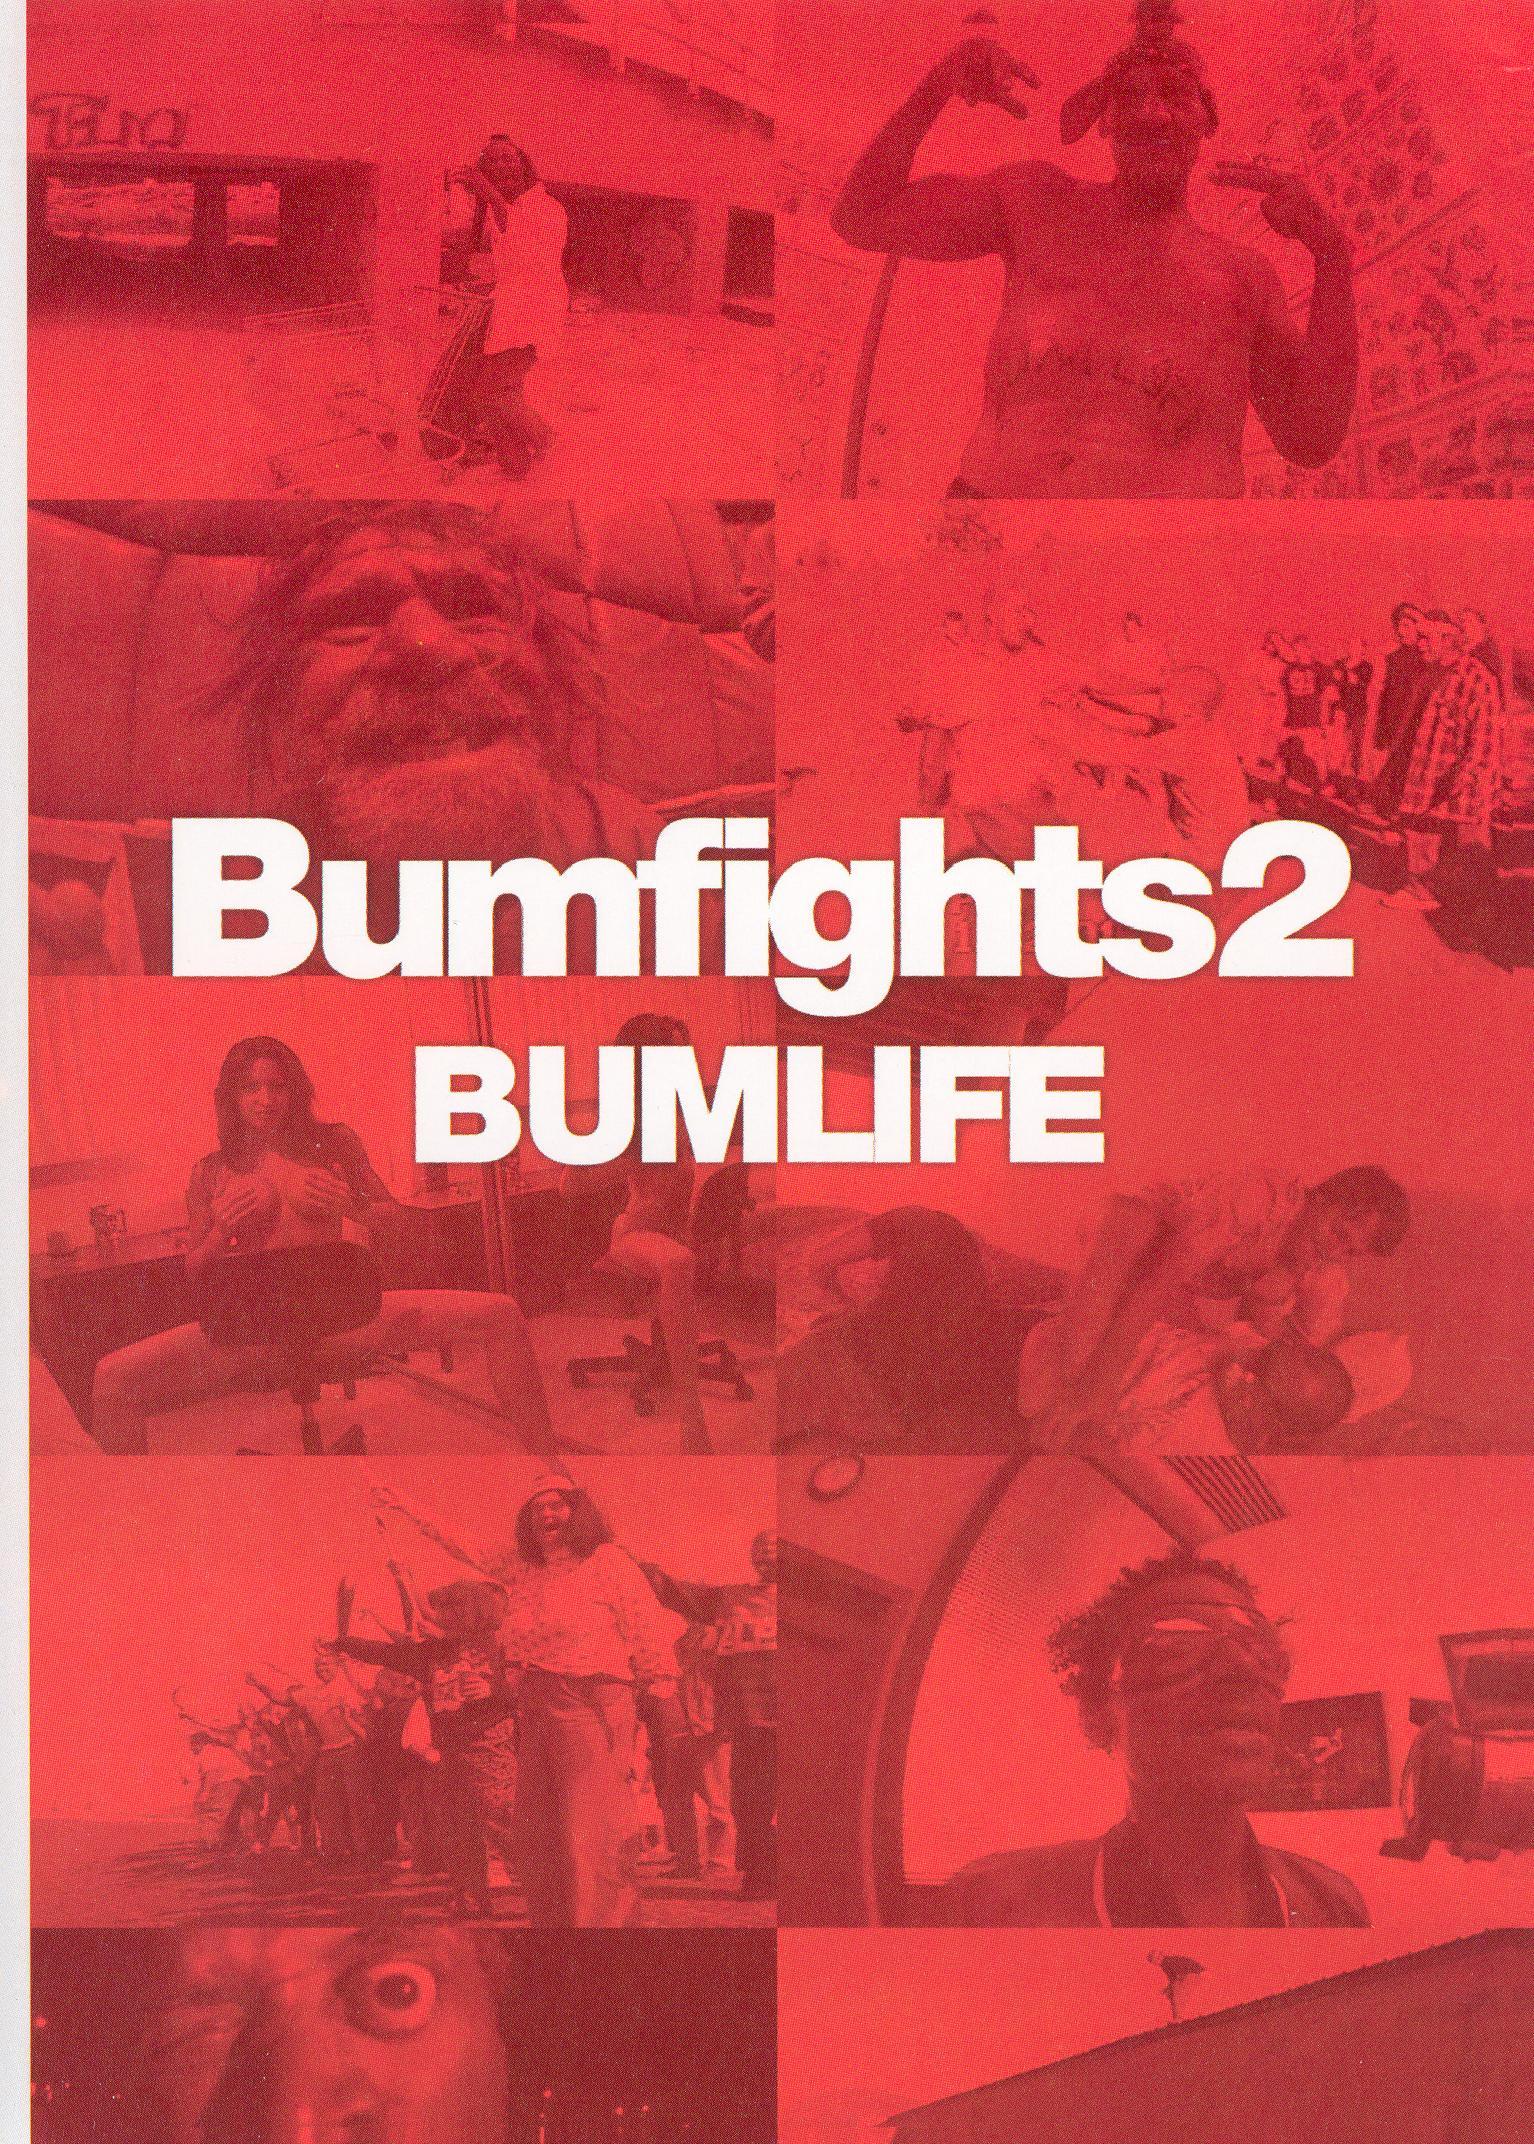 Bumfights, Vol. 2: Bumlife